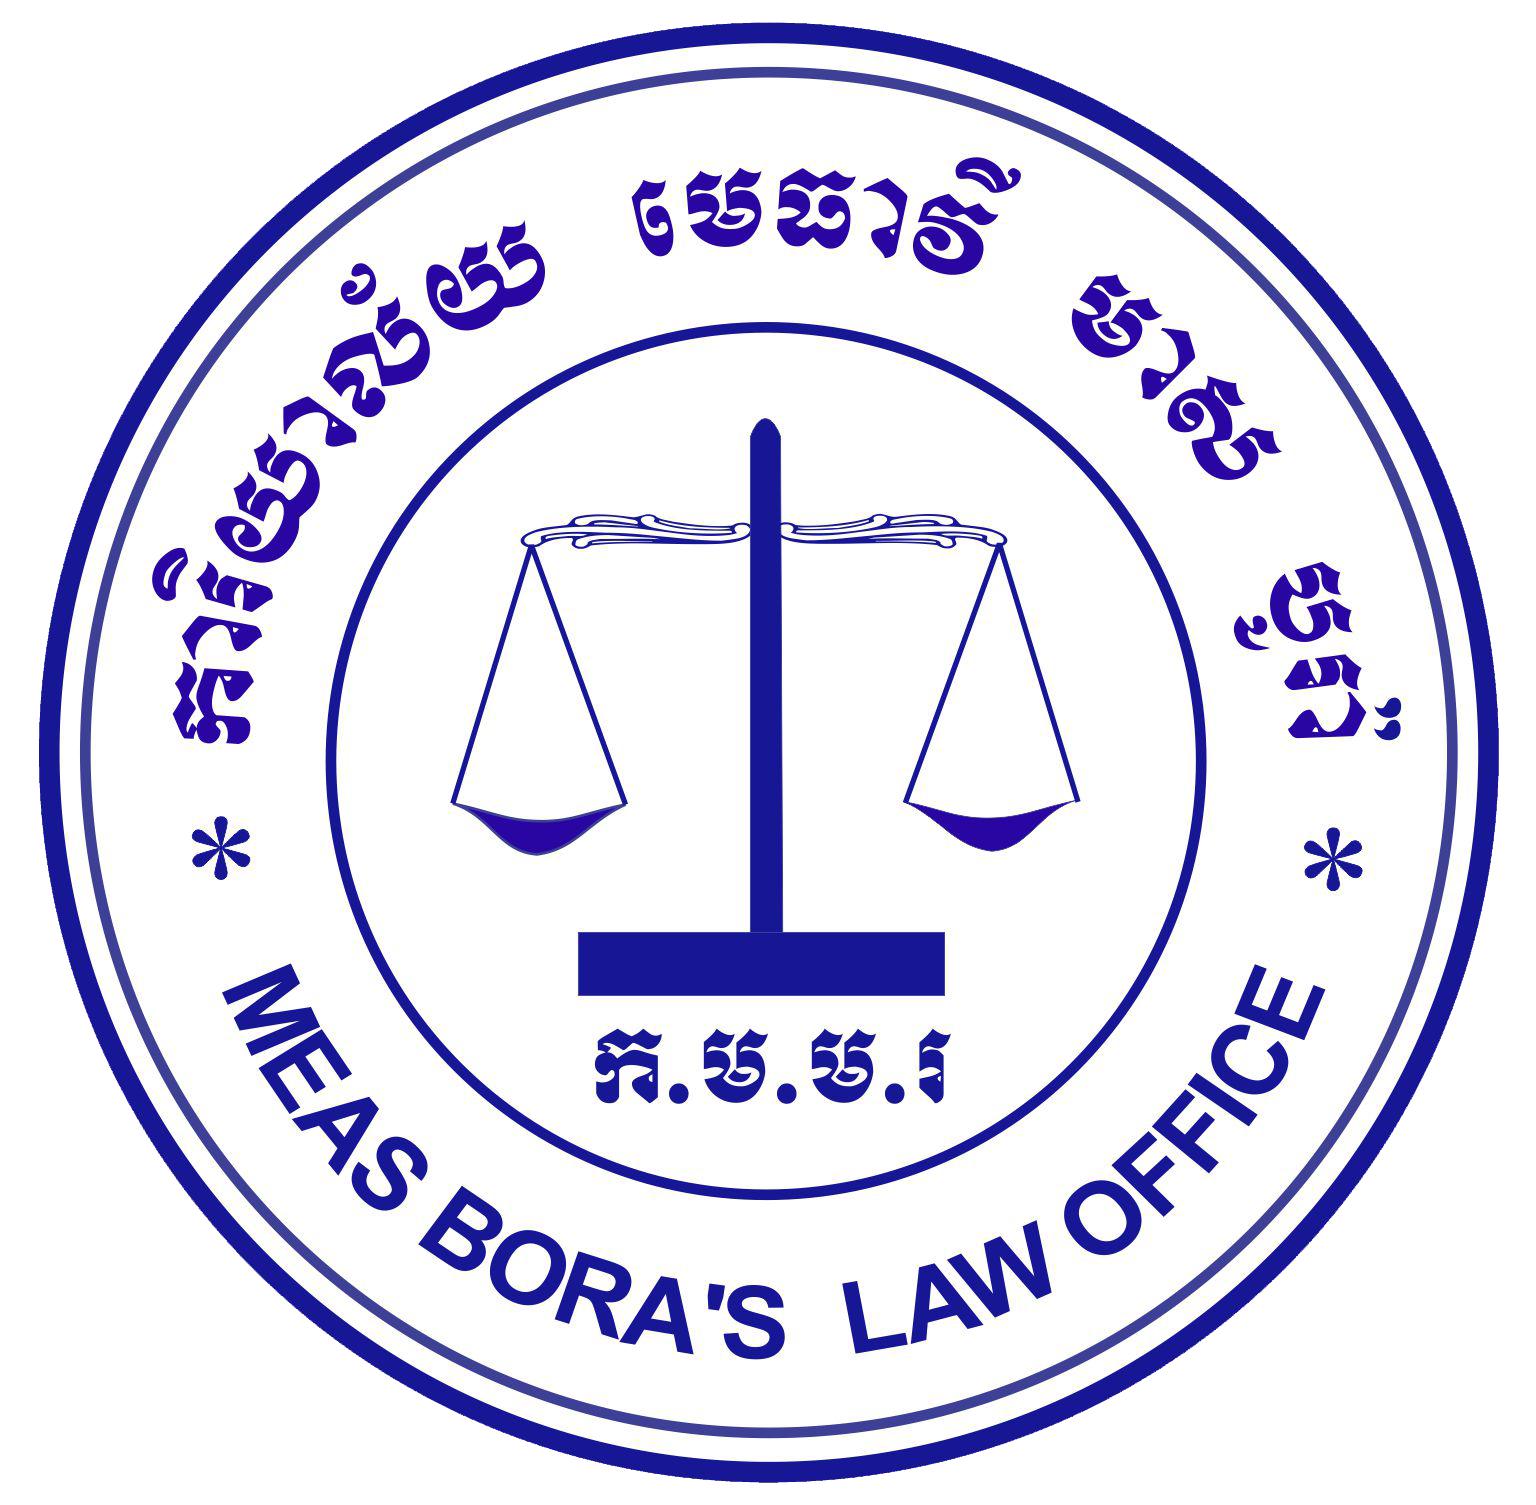 Measbora Laws